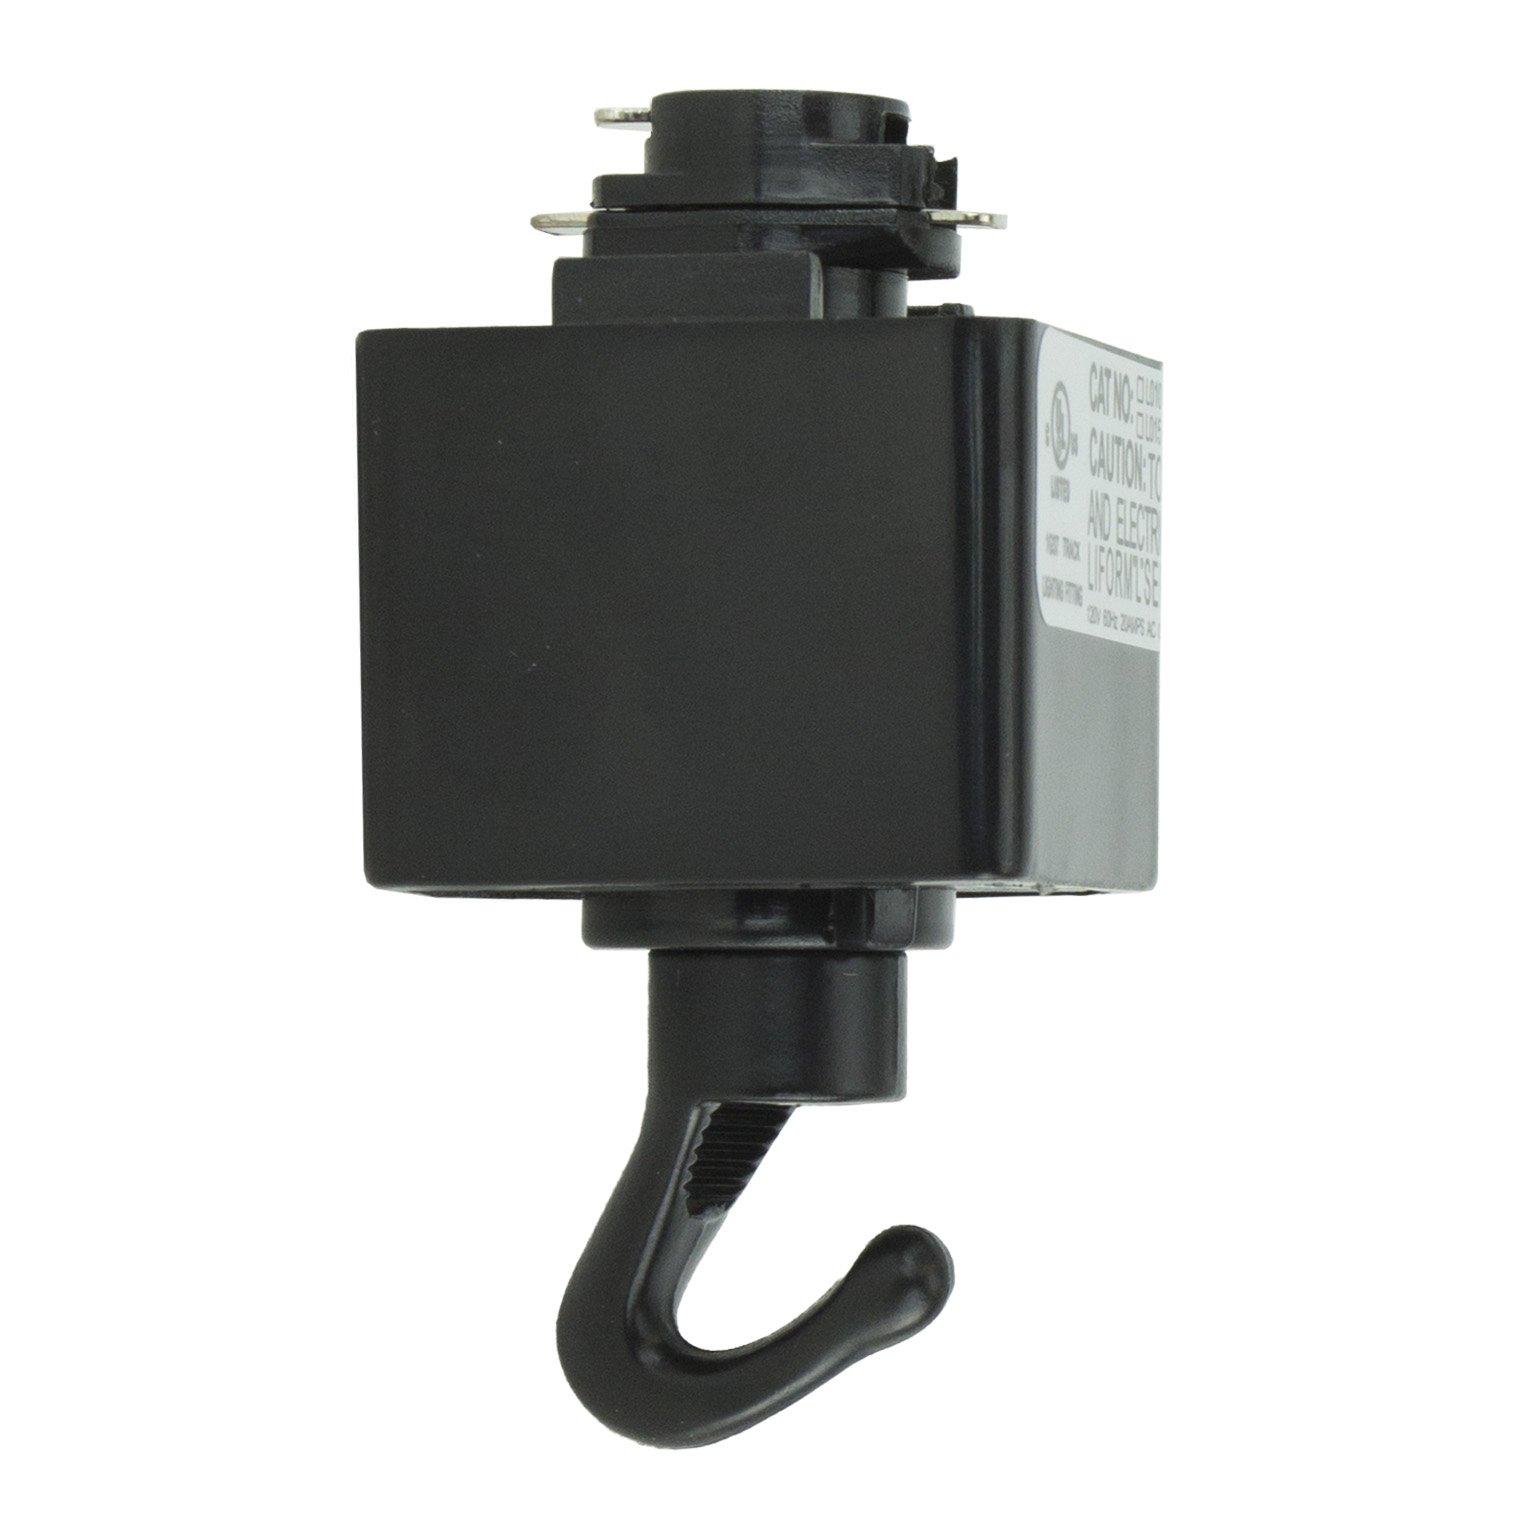 Direct-Lighting H System Track Adapter with Hook H870-BK (Black)